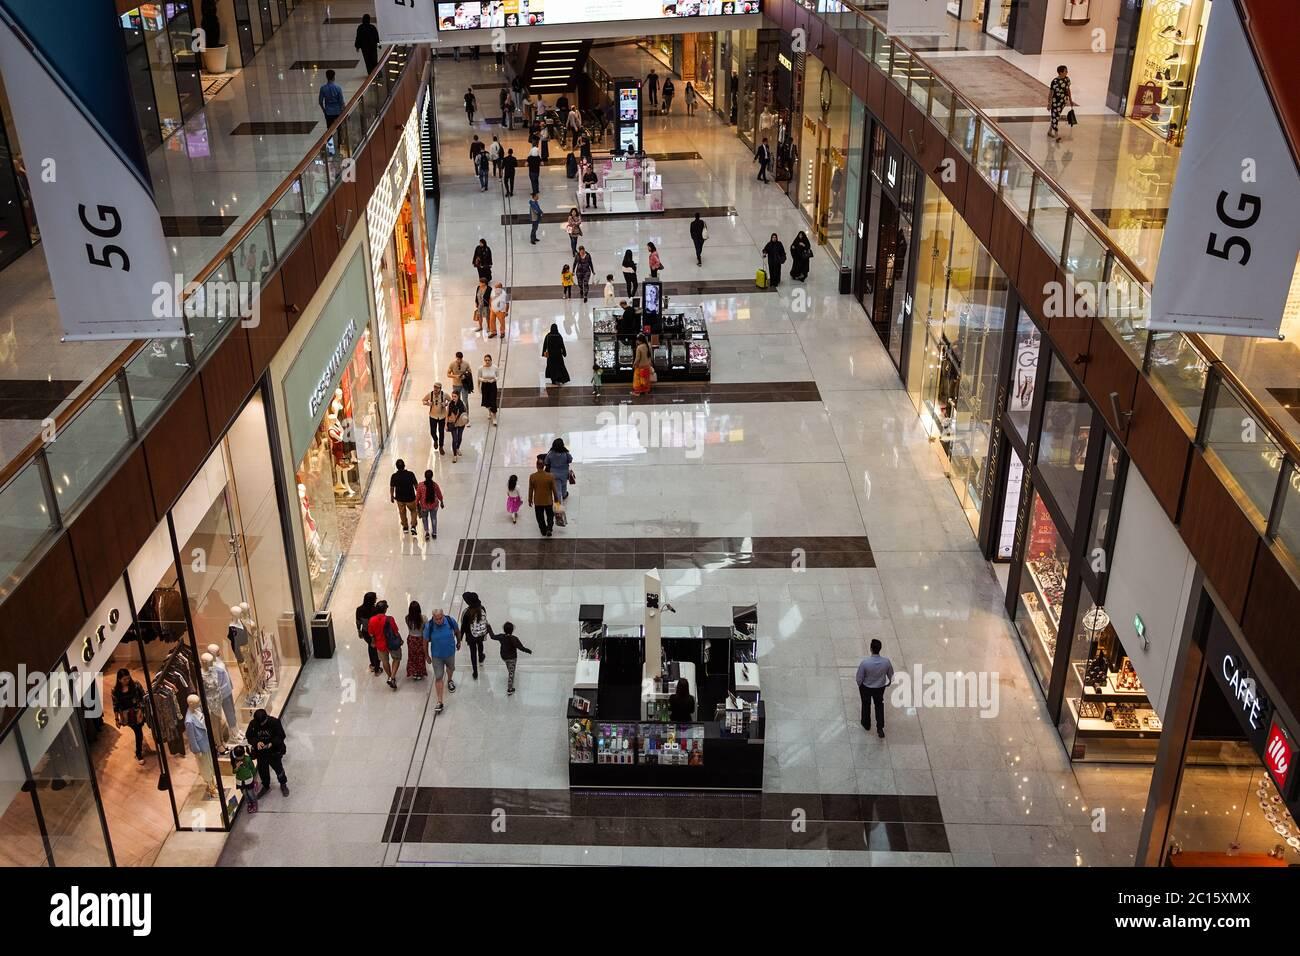 Dubai / United Arab Emirates - February 1, 2020: Indoor photo of Dubai Mall with multi ethnic crowd of tourists shopping on it Stock Photo